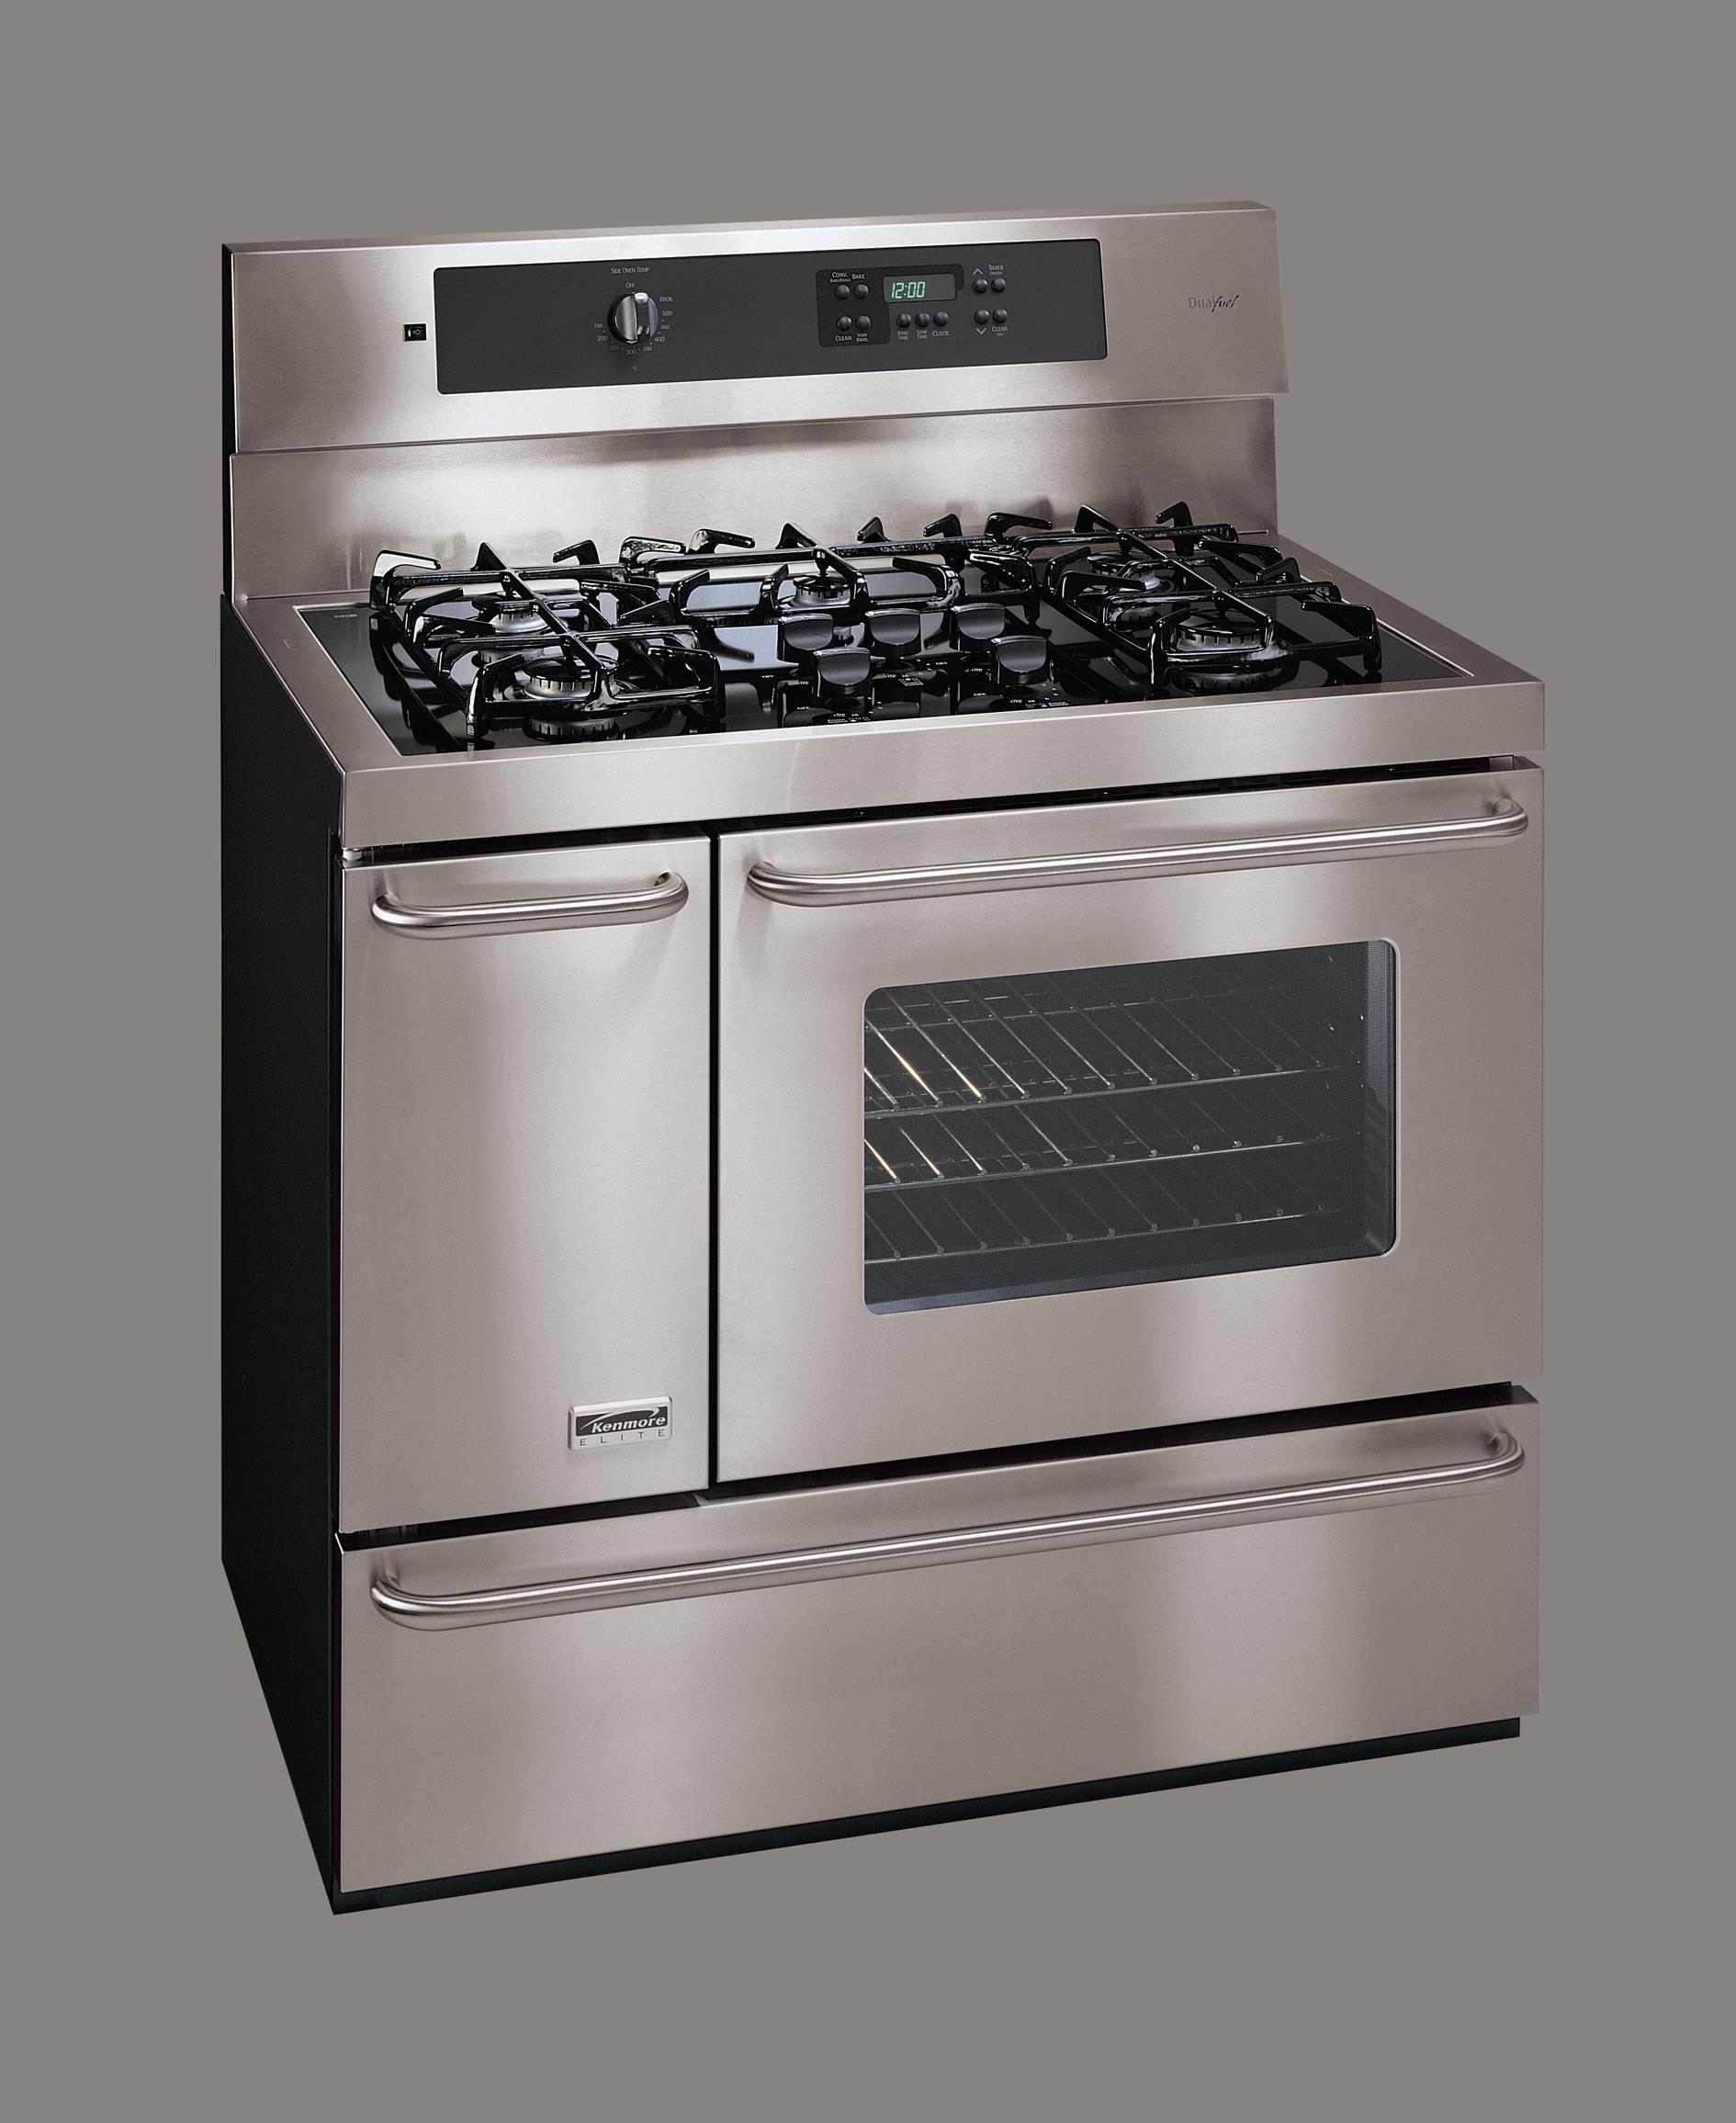 Kenmore Range/Stove/Oven Model 790.75503208 Parts